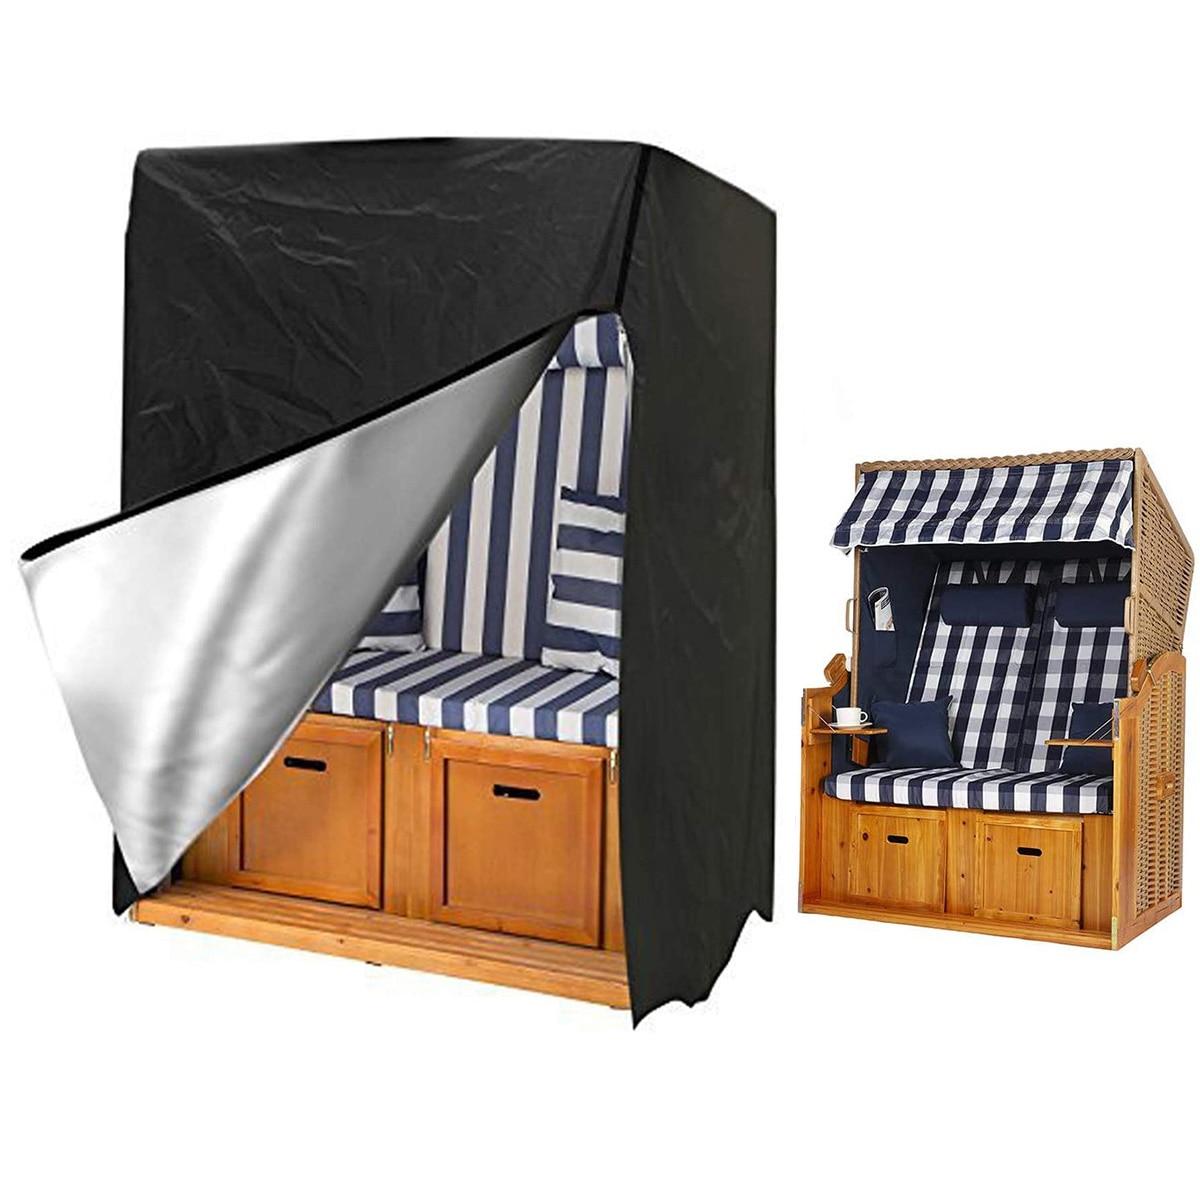 Swing Hammock Table Furniture Cover Waterproof Dustproof UV Protector Outdoor Patio Garden Rain Snow Chair Sofa covers